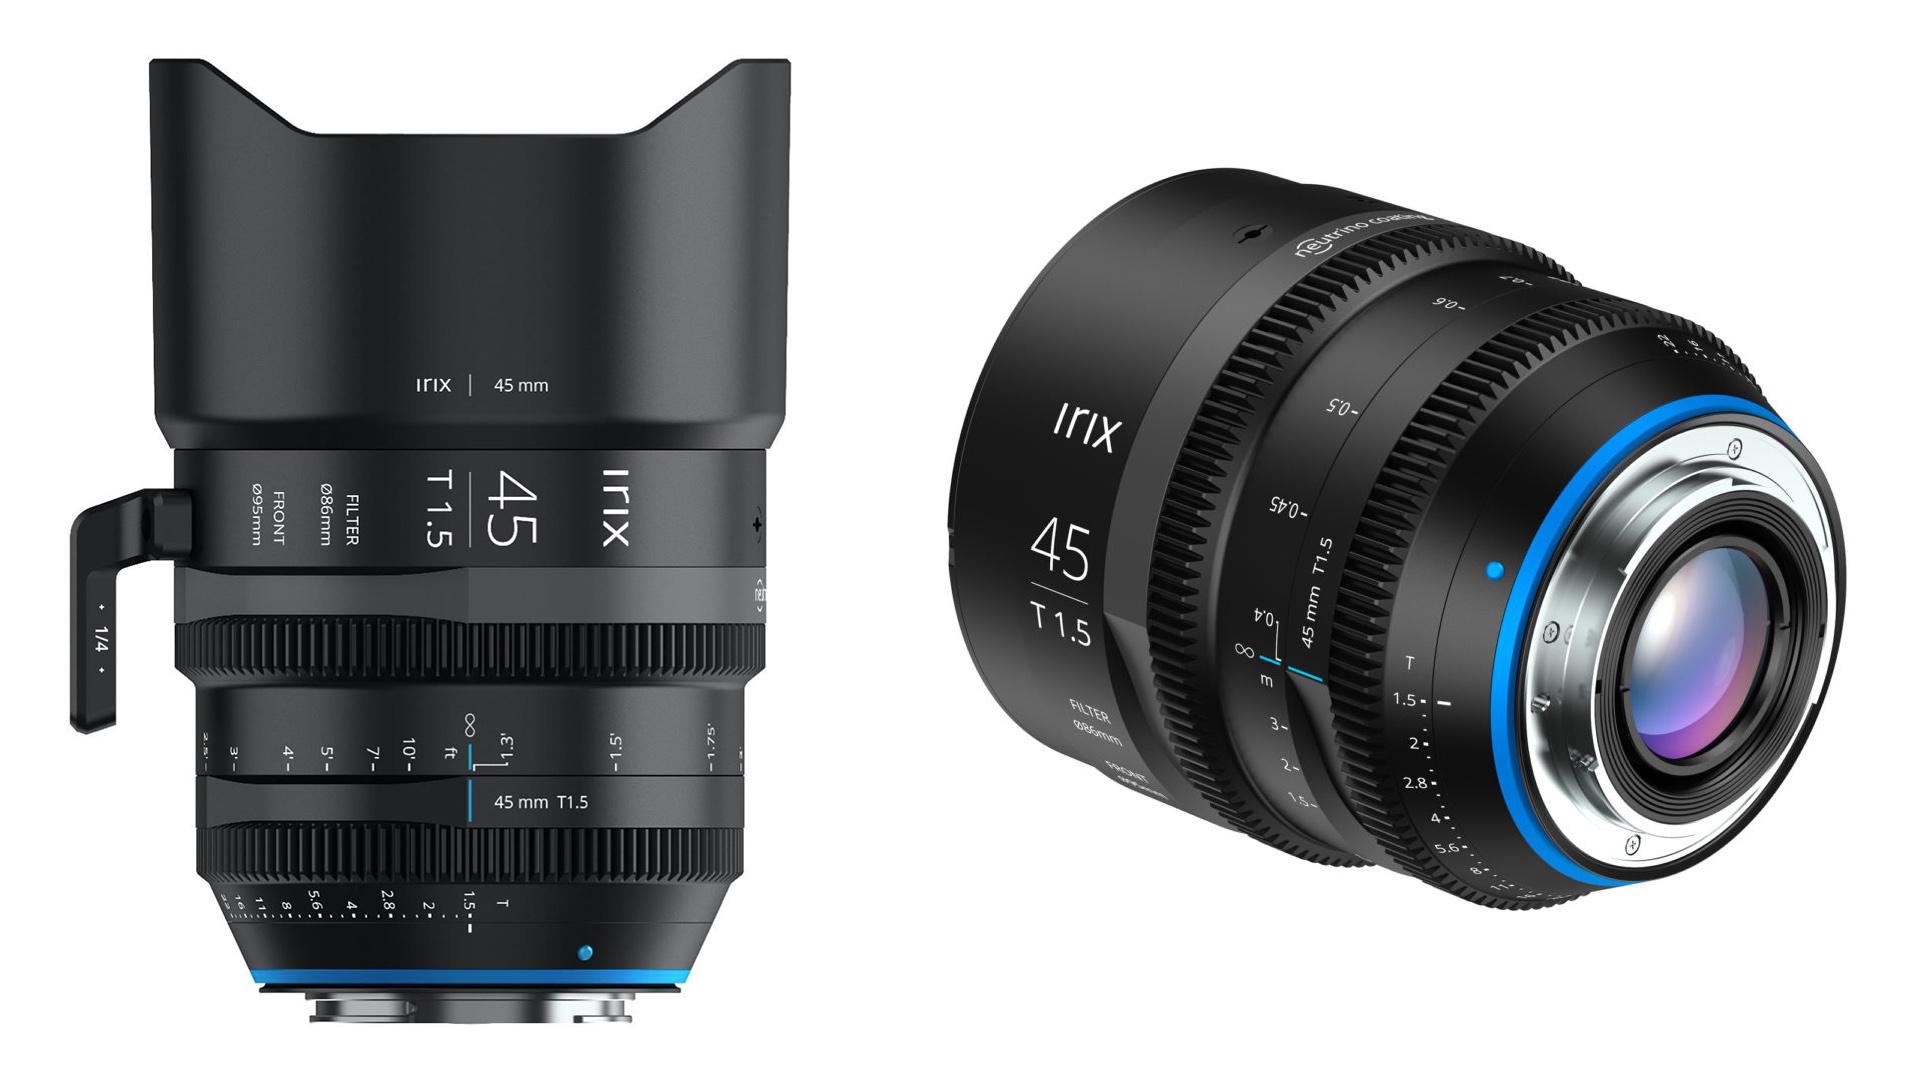 Irix 45mm T1.5 - anuncian lente prime rápido de cine